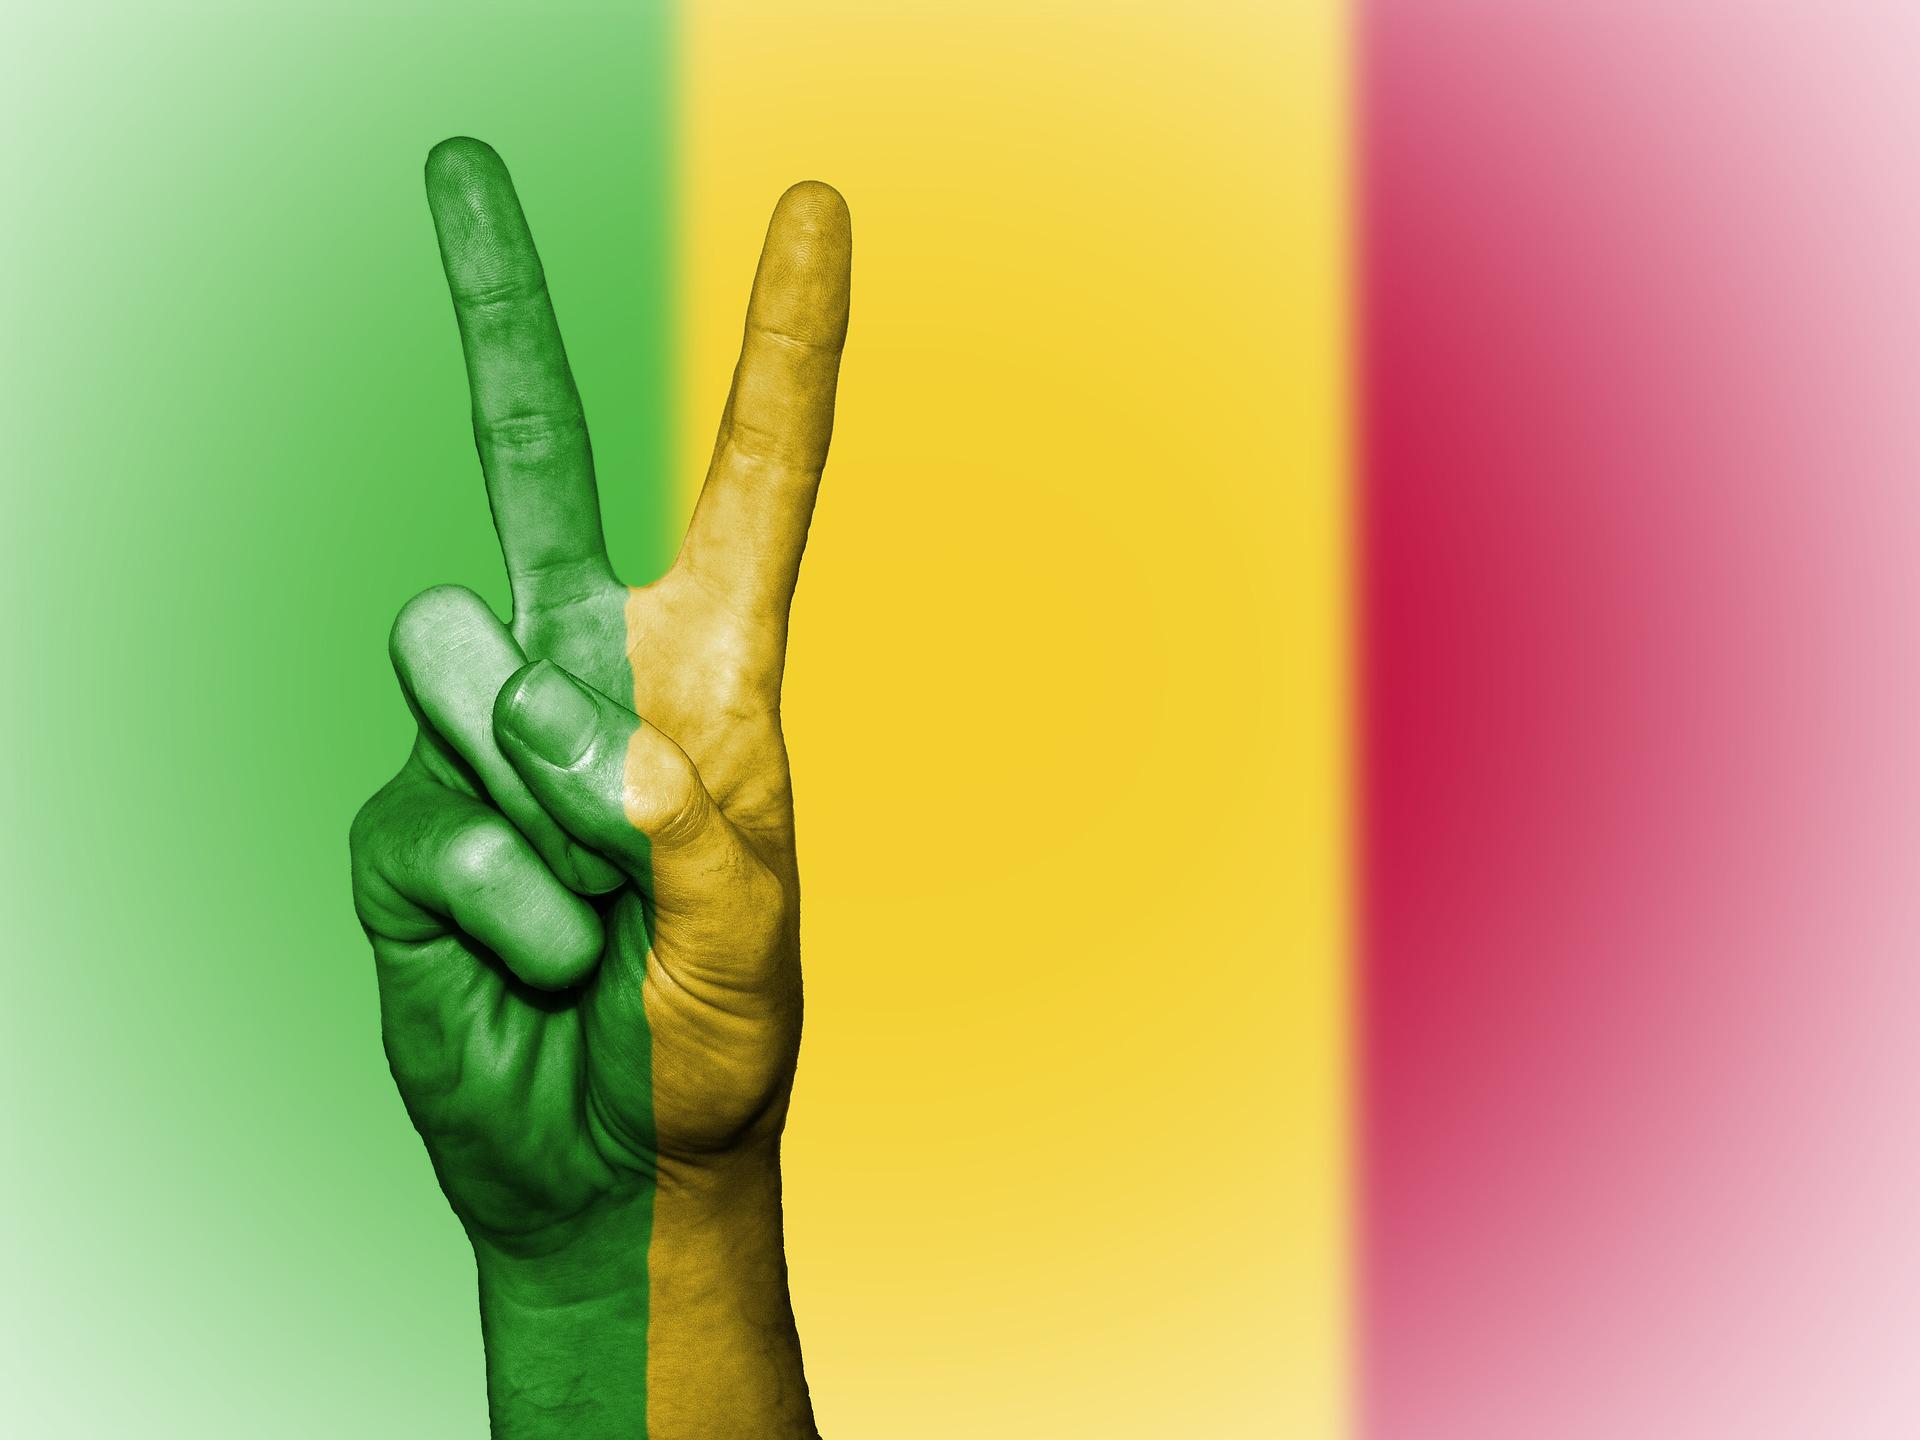 TWR broadcasts hope amid Mali crisis